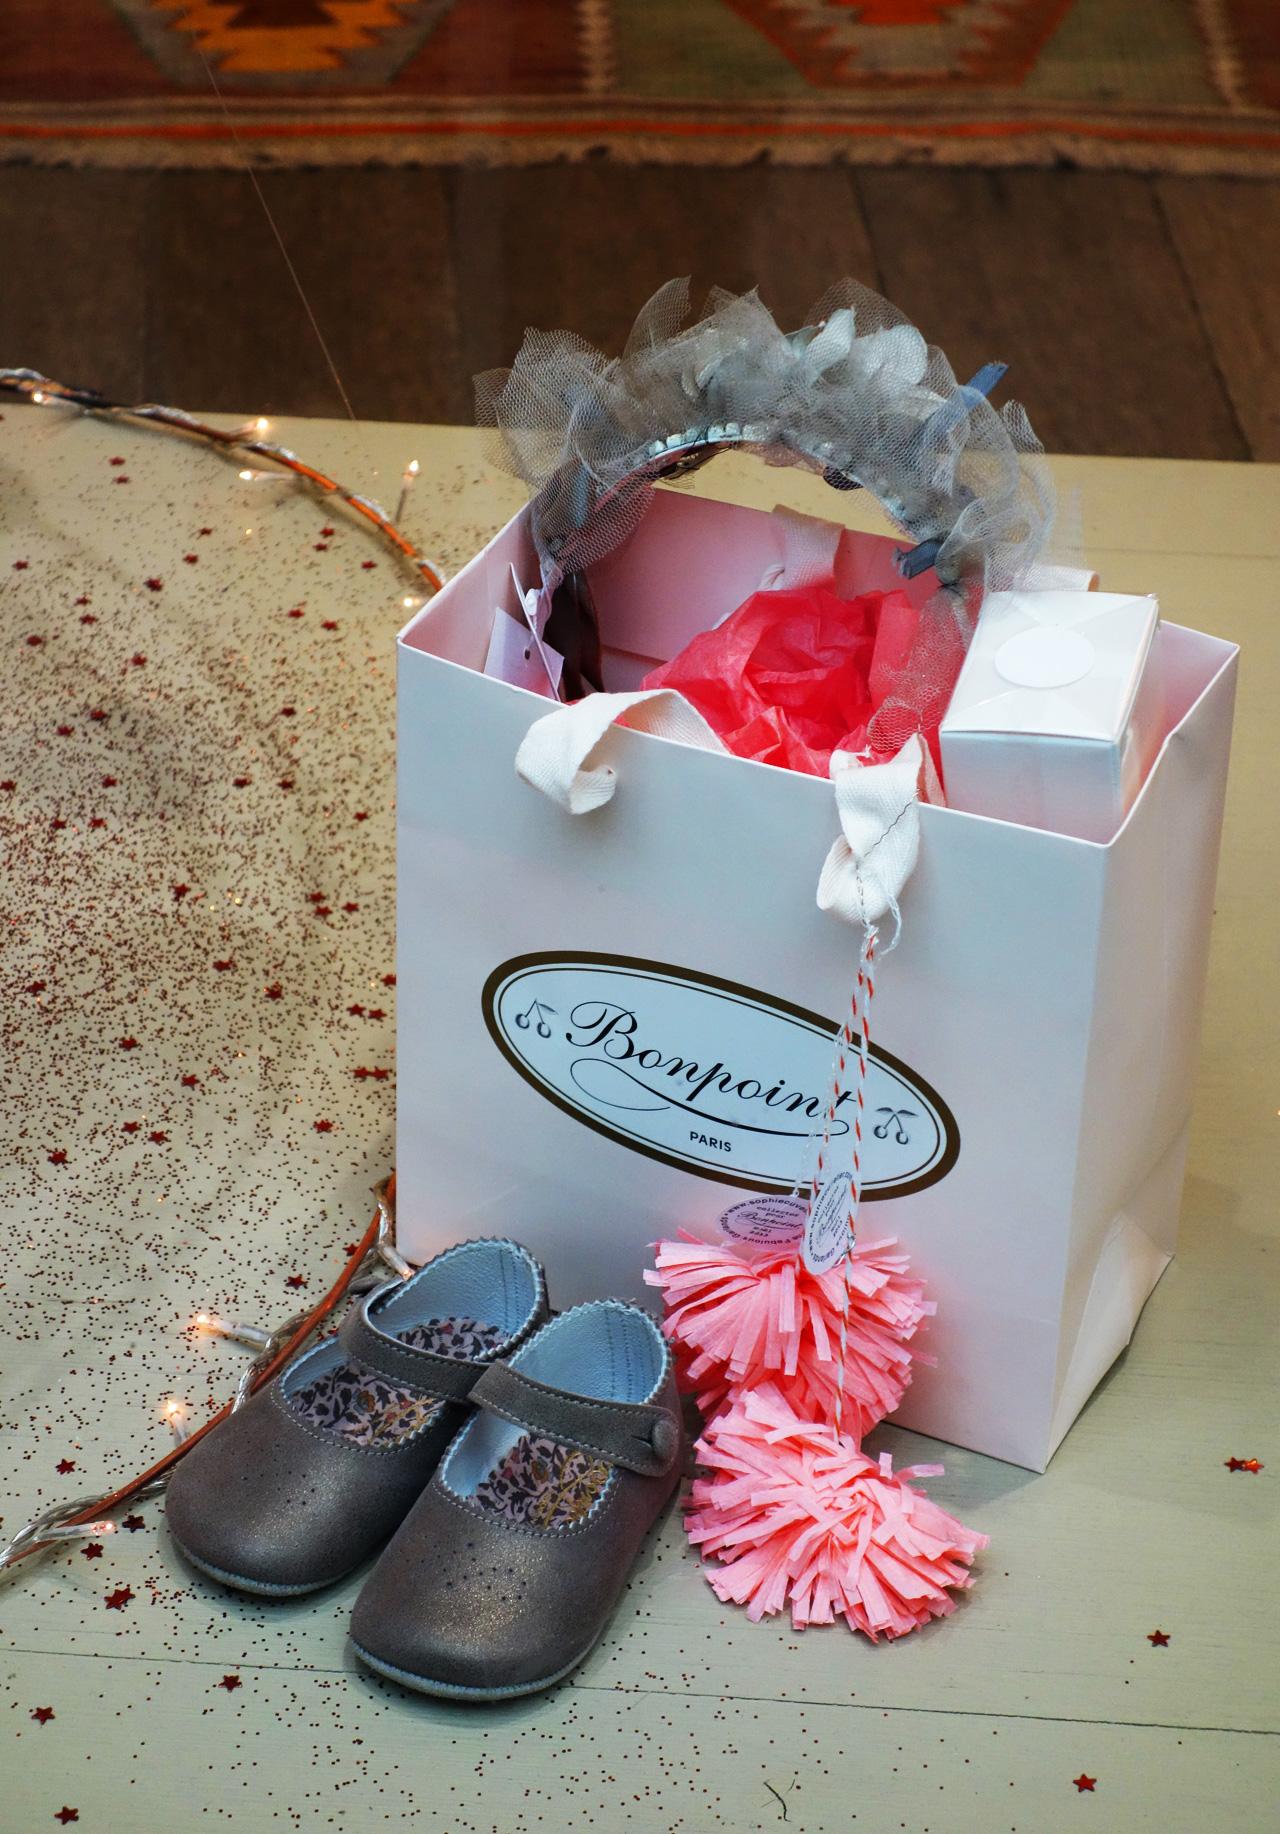 bonpoint-vitrine-noel-2013-cadeaux